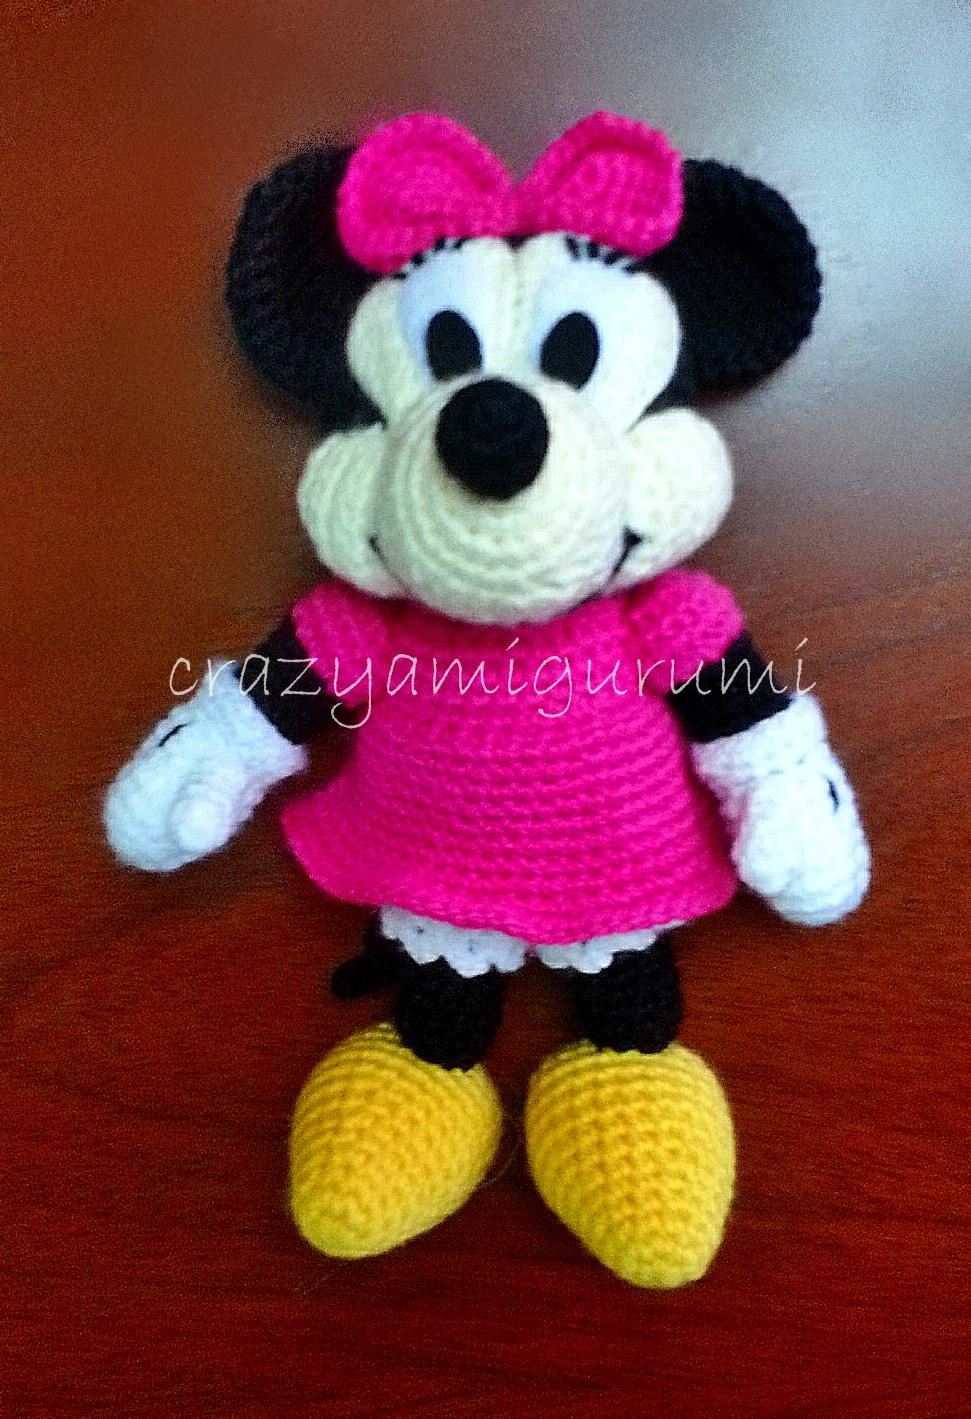 Amigurumi Free Minnie Mouse Pattern : Minnie Mouse - Amigurumi by zulemax on DeviantArt